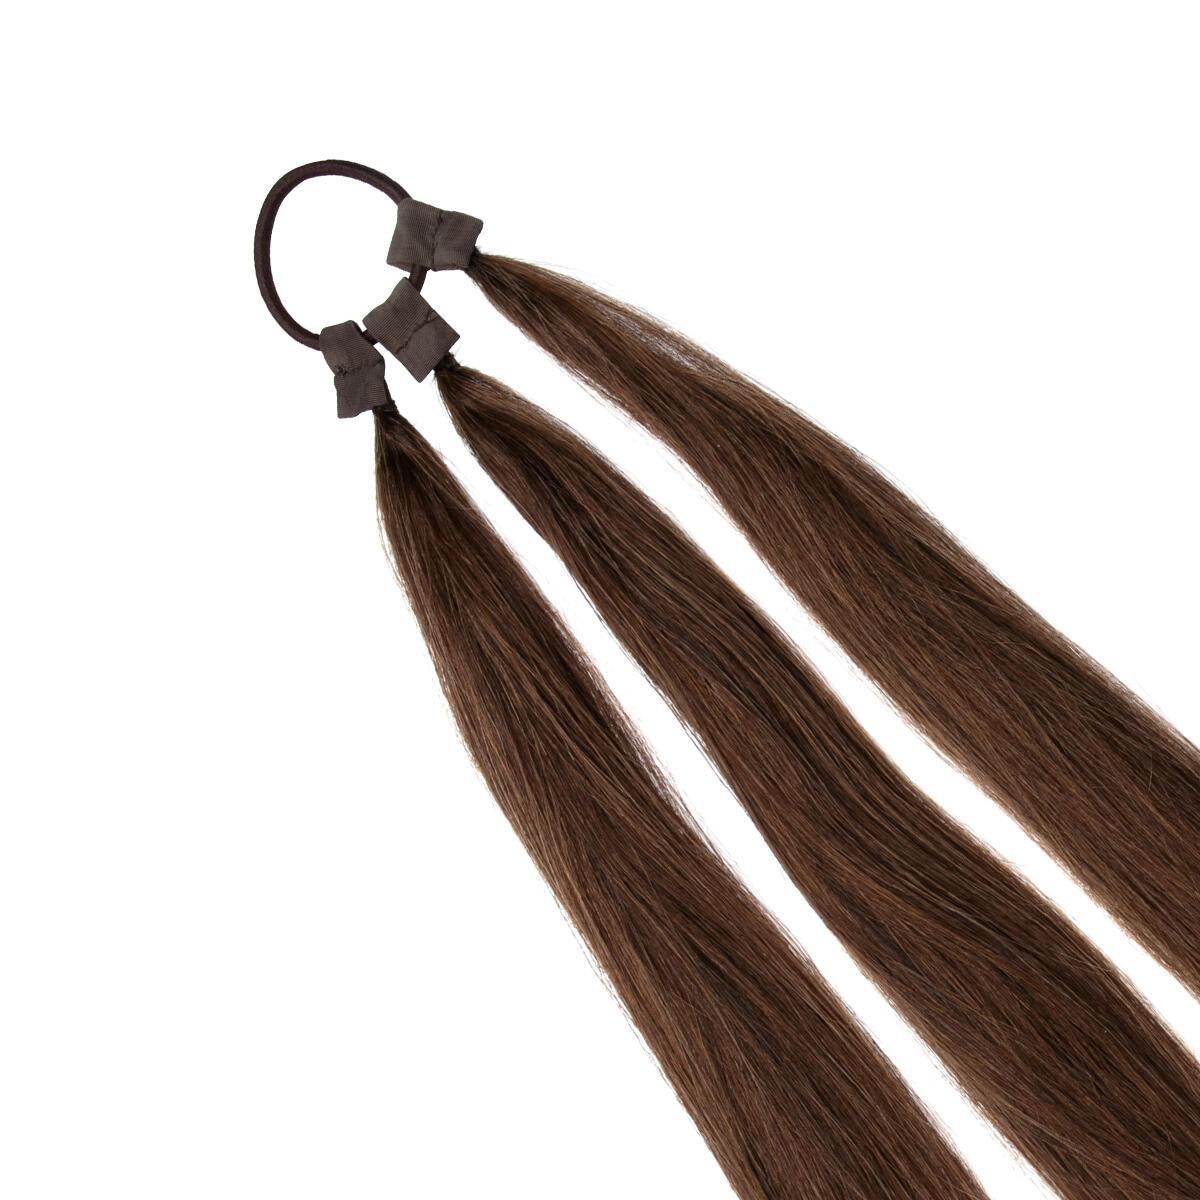 Easy Braid For voluminous braids M2.3/5.0 Chocolate Mix 55 cm